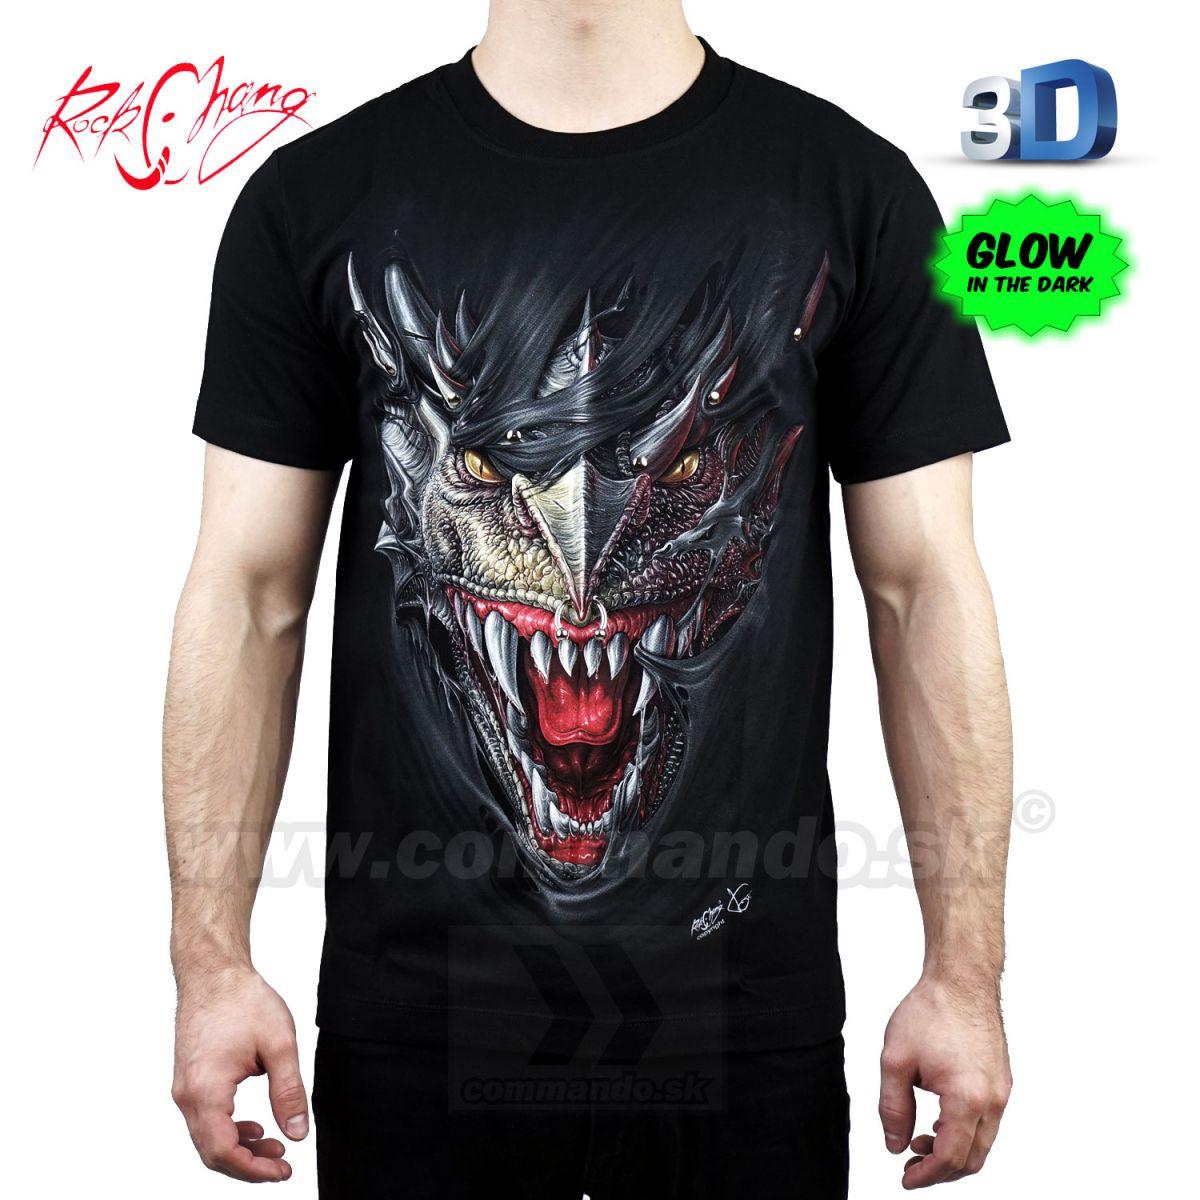 d480b178eec2 Tričko 3D King Dragon Rock Chang 3D115 T-Shirt